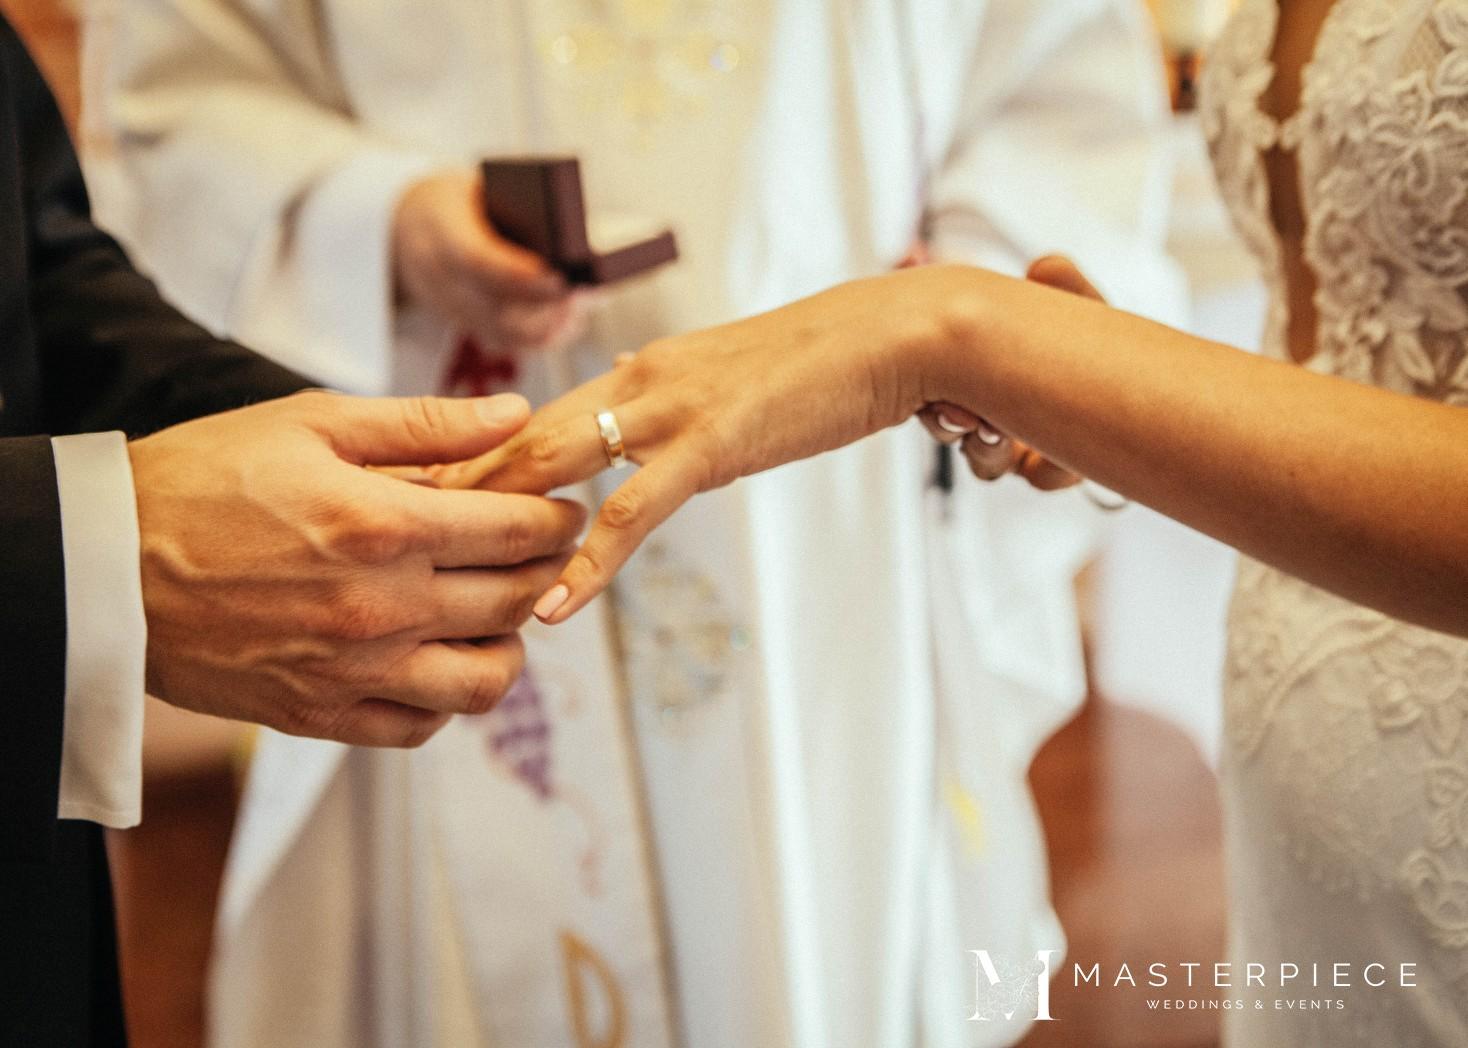 Masterpiece_Weddings_sluby_064